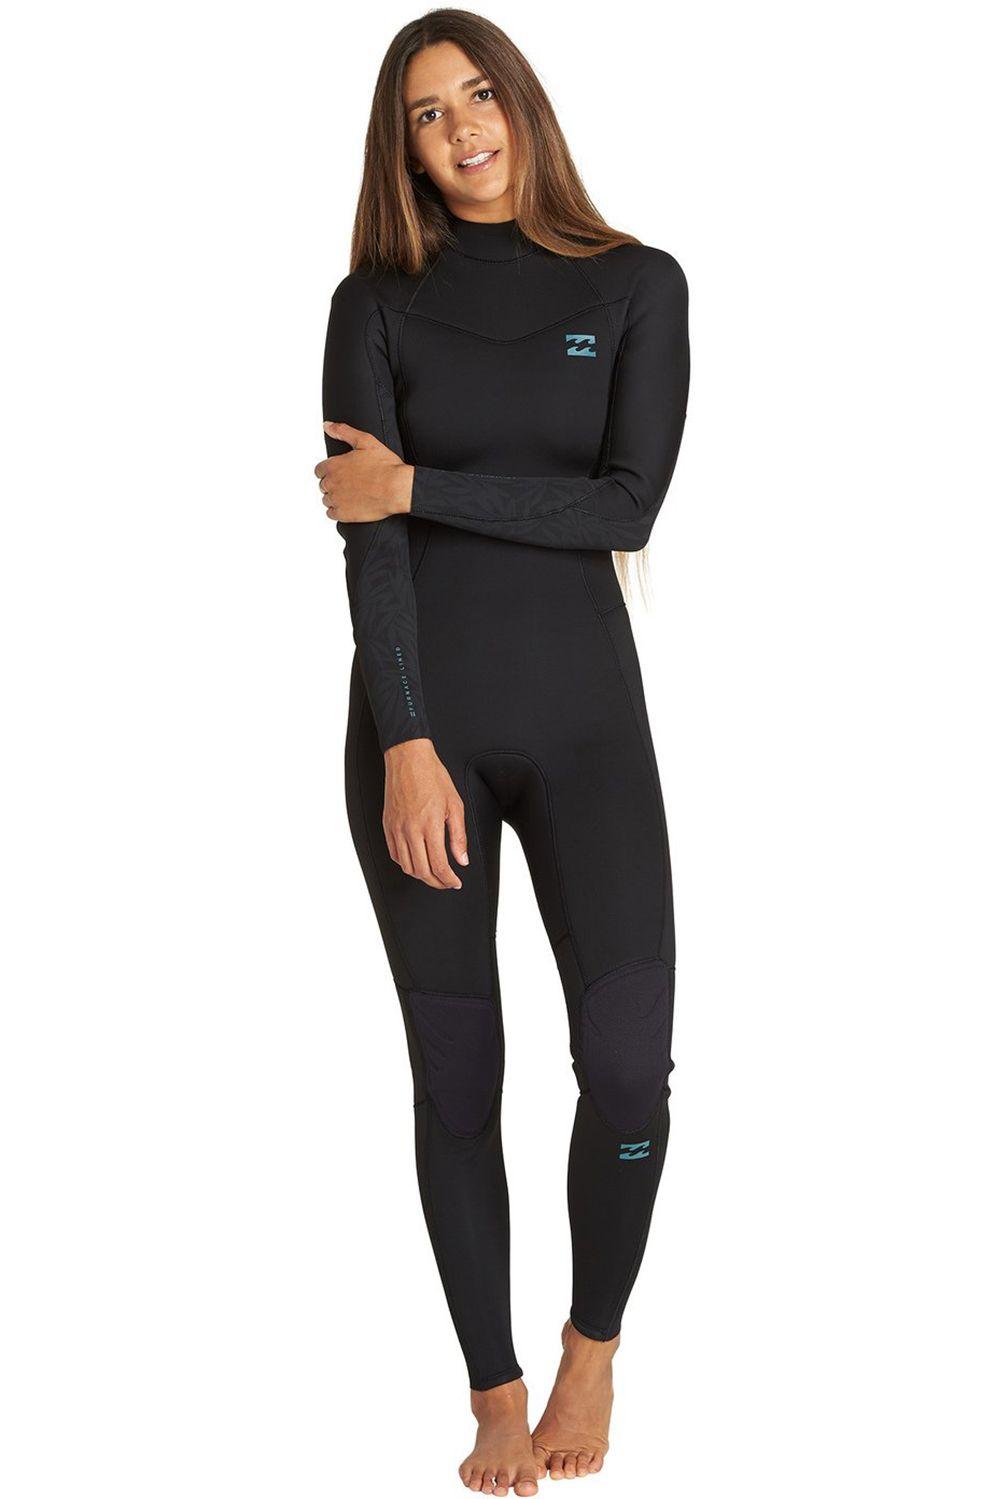 Billabong Wetsuit 302 FURN SYN BZ GBS Black